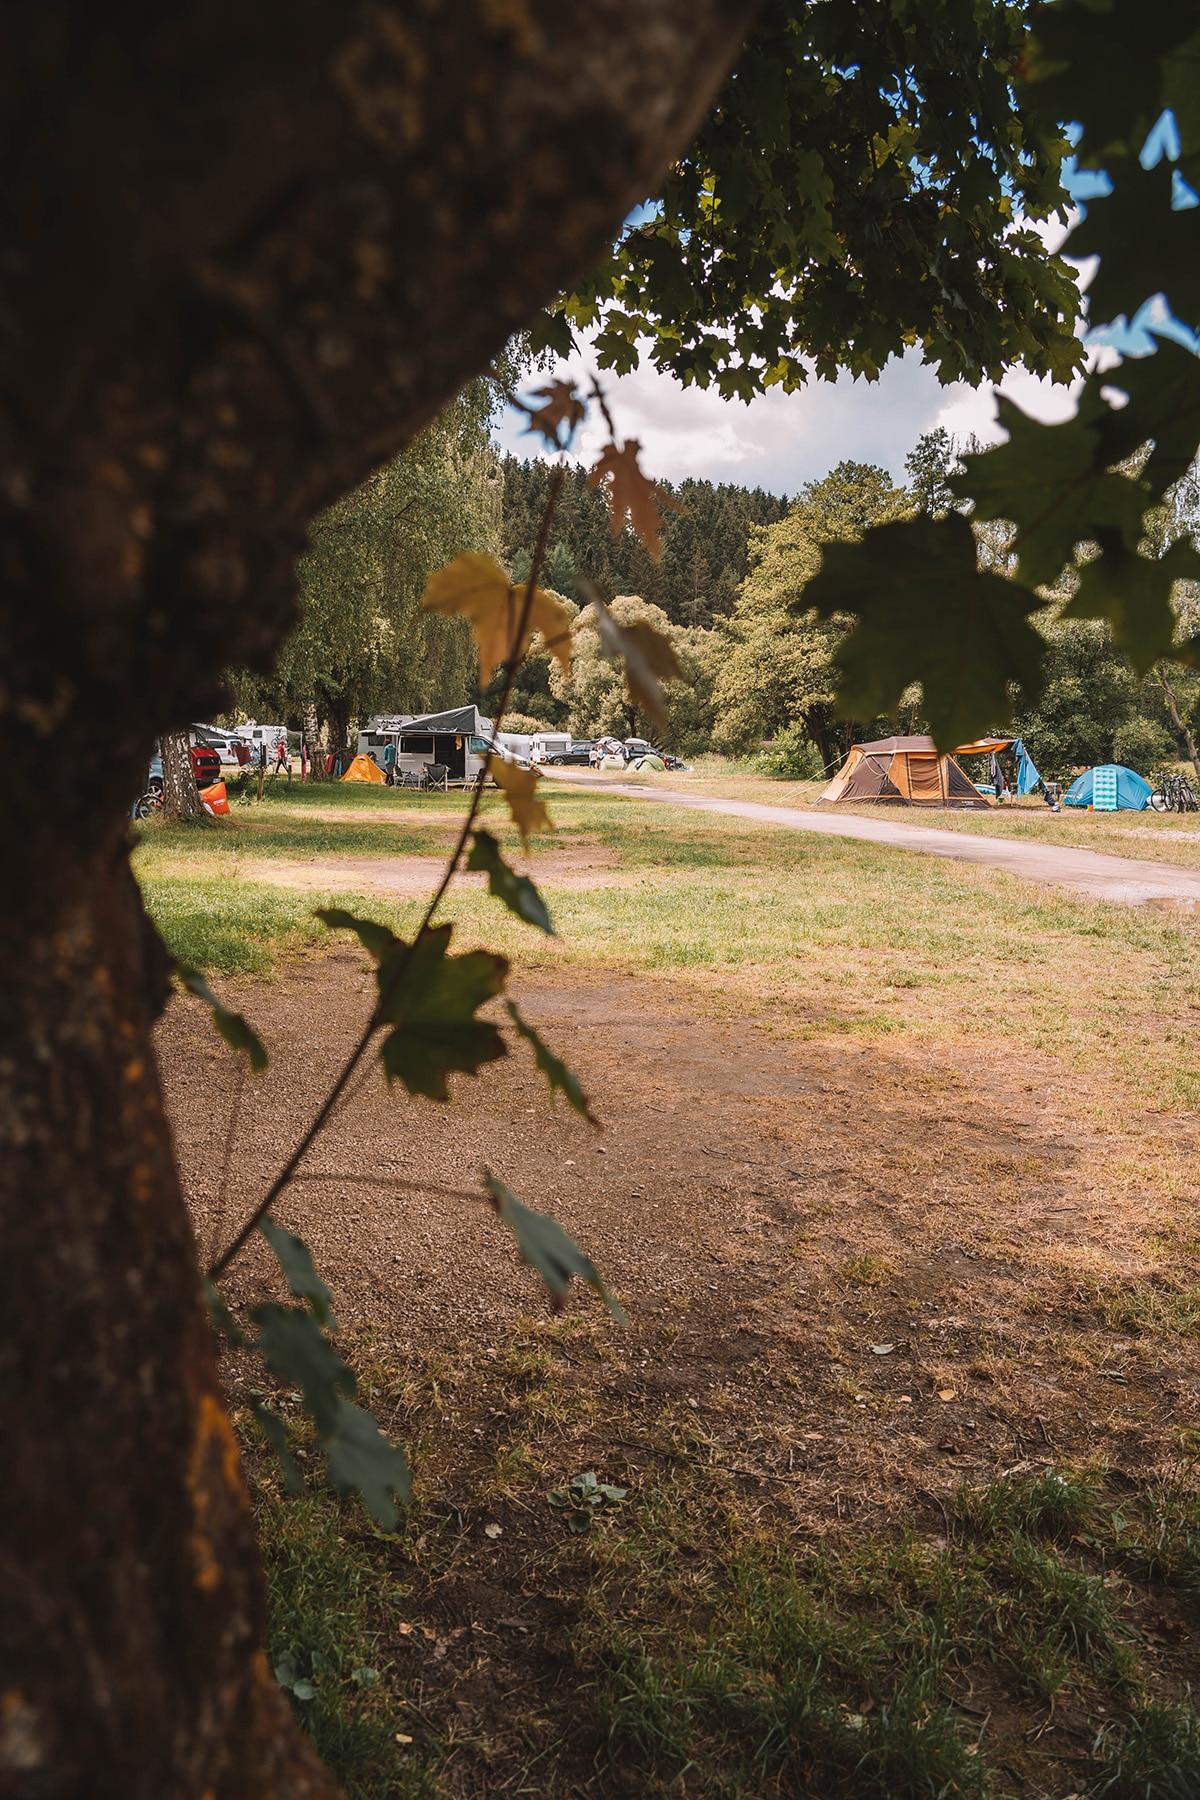 schnitzmuehle-camping-platz-baum